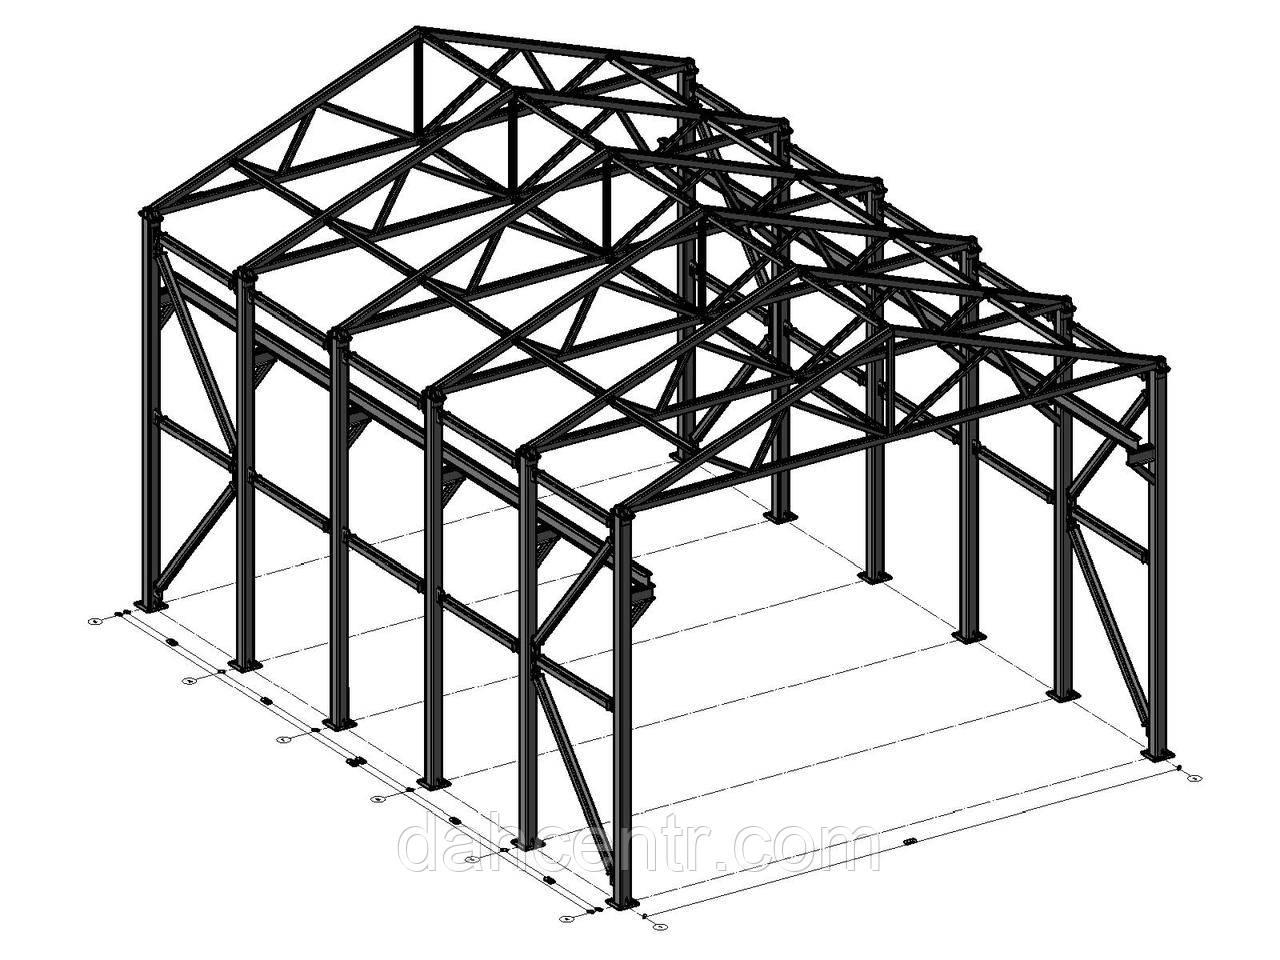 Склад 15х24 ангар, навес, фермы, стойки, под цех, зерно, сто, здание.